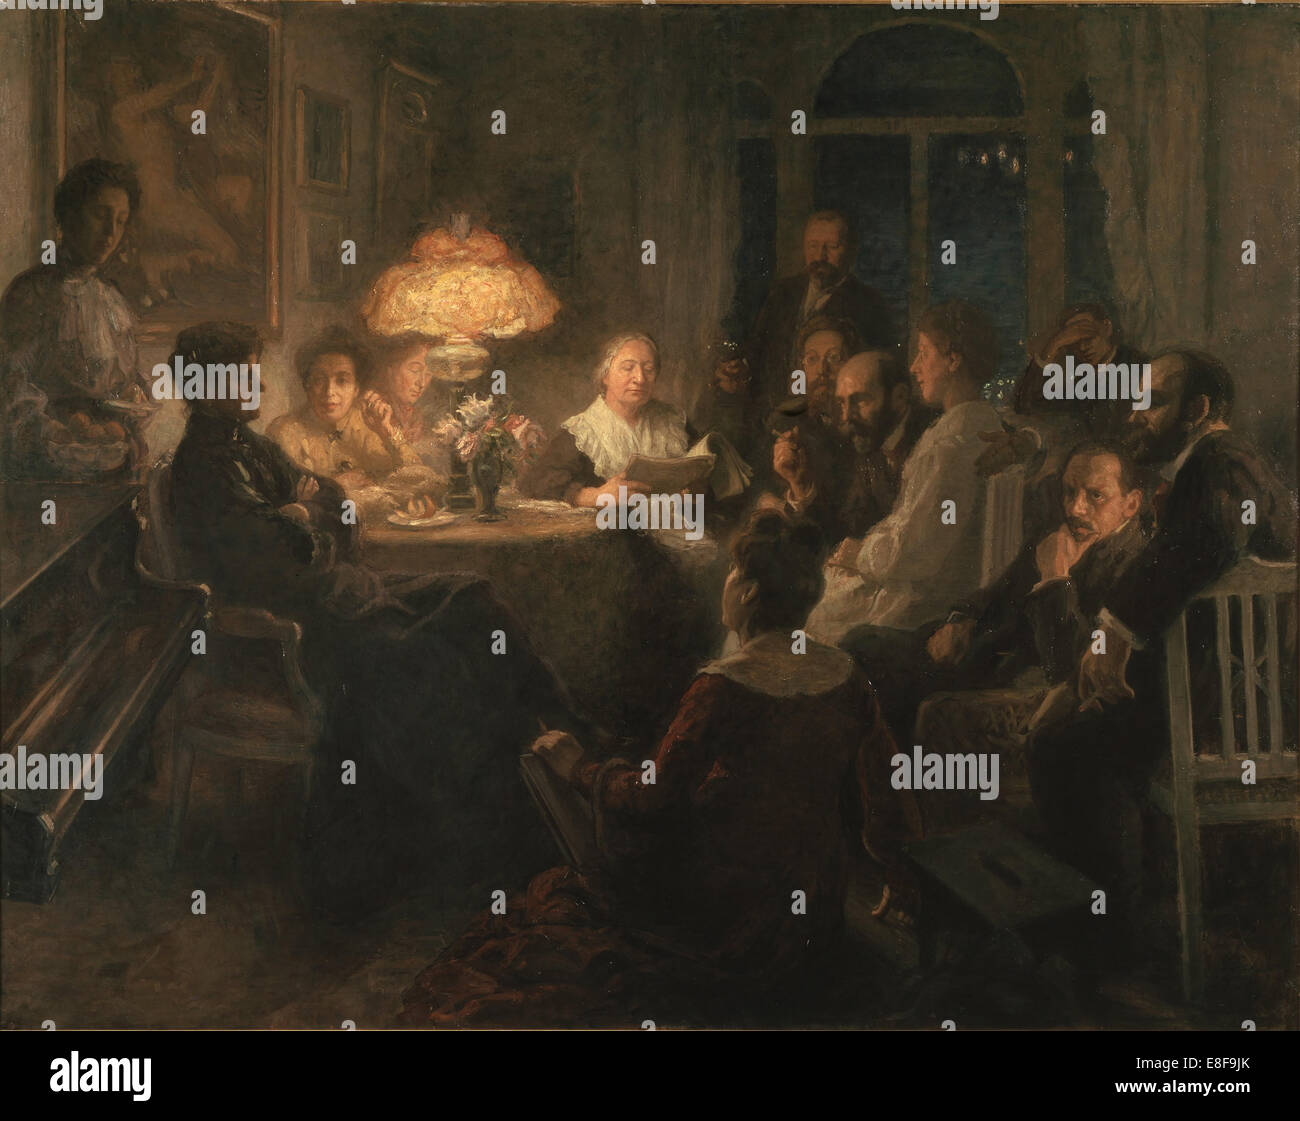 Friends. Artist: Pauli (Hirsch-Pauli), Hanna (1864-1940) - Stock Image